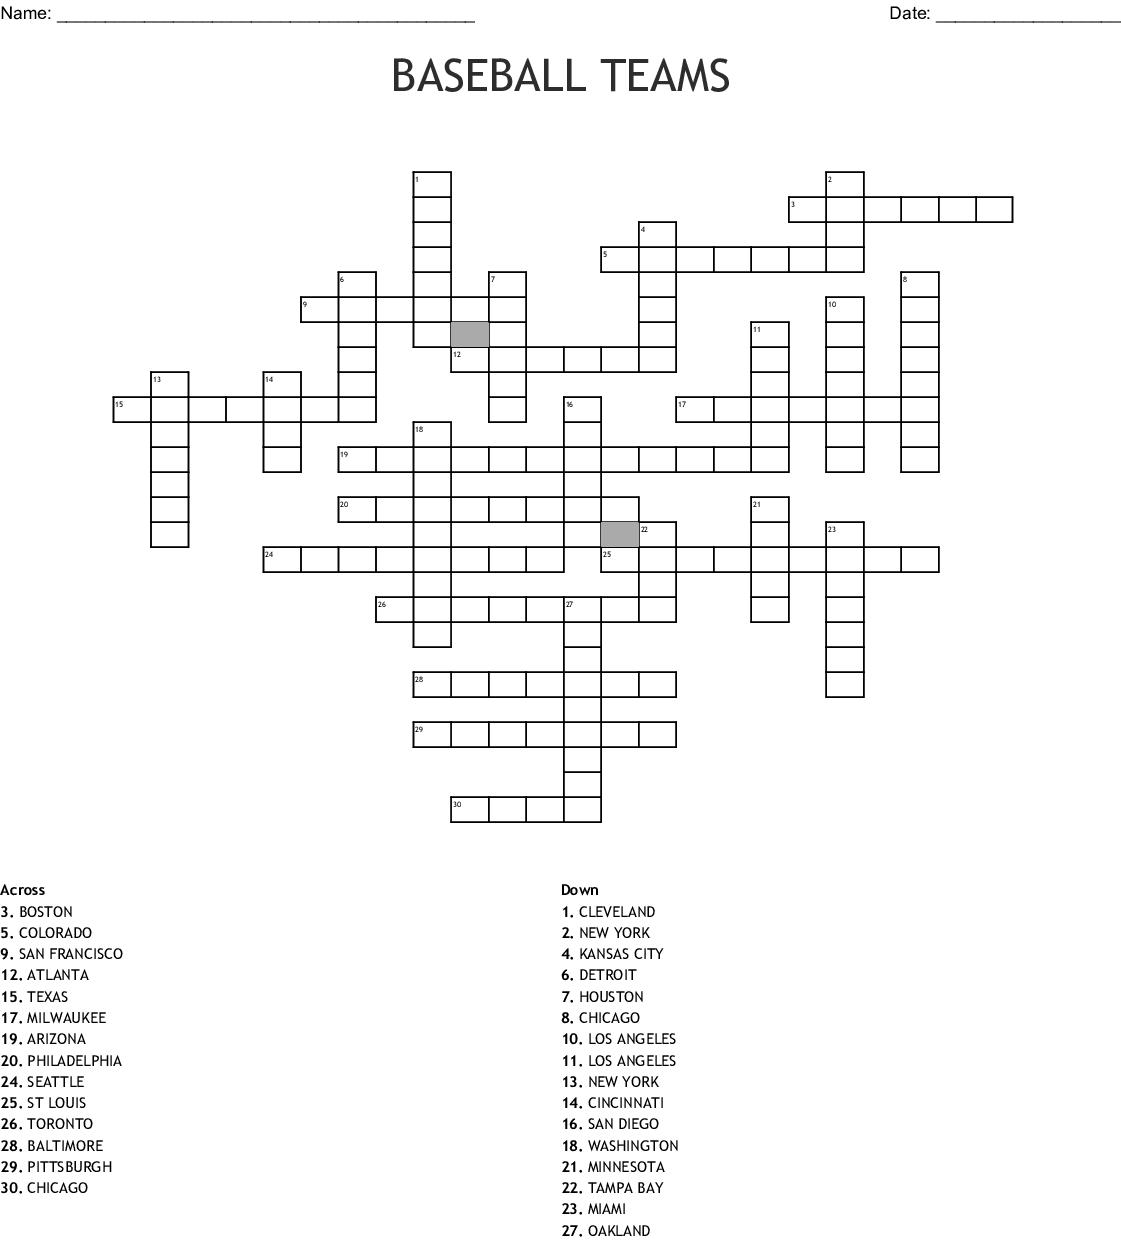 Baseball Teams Crossword